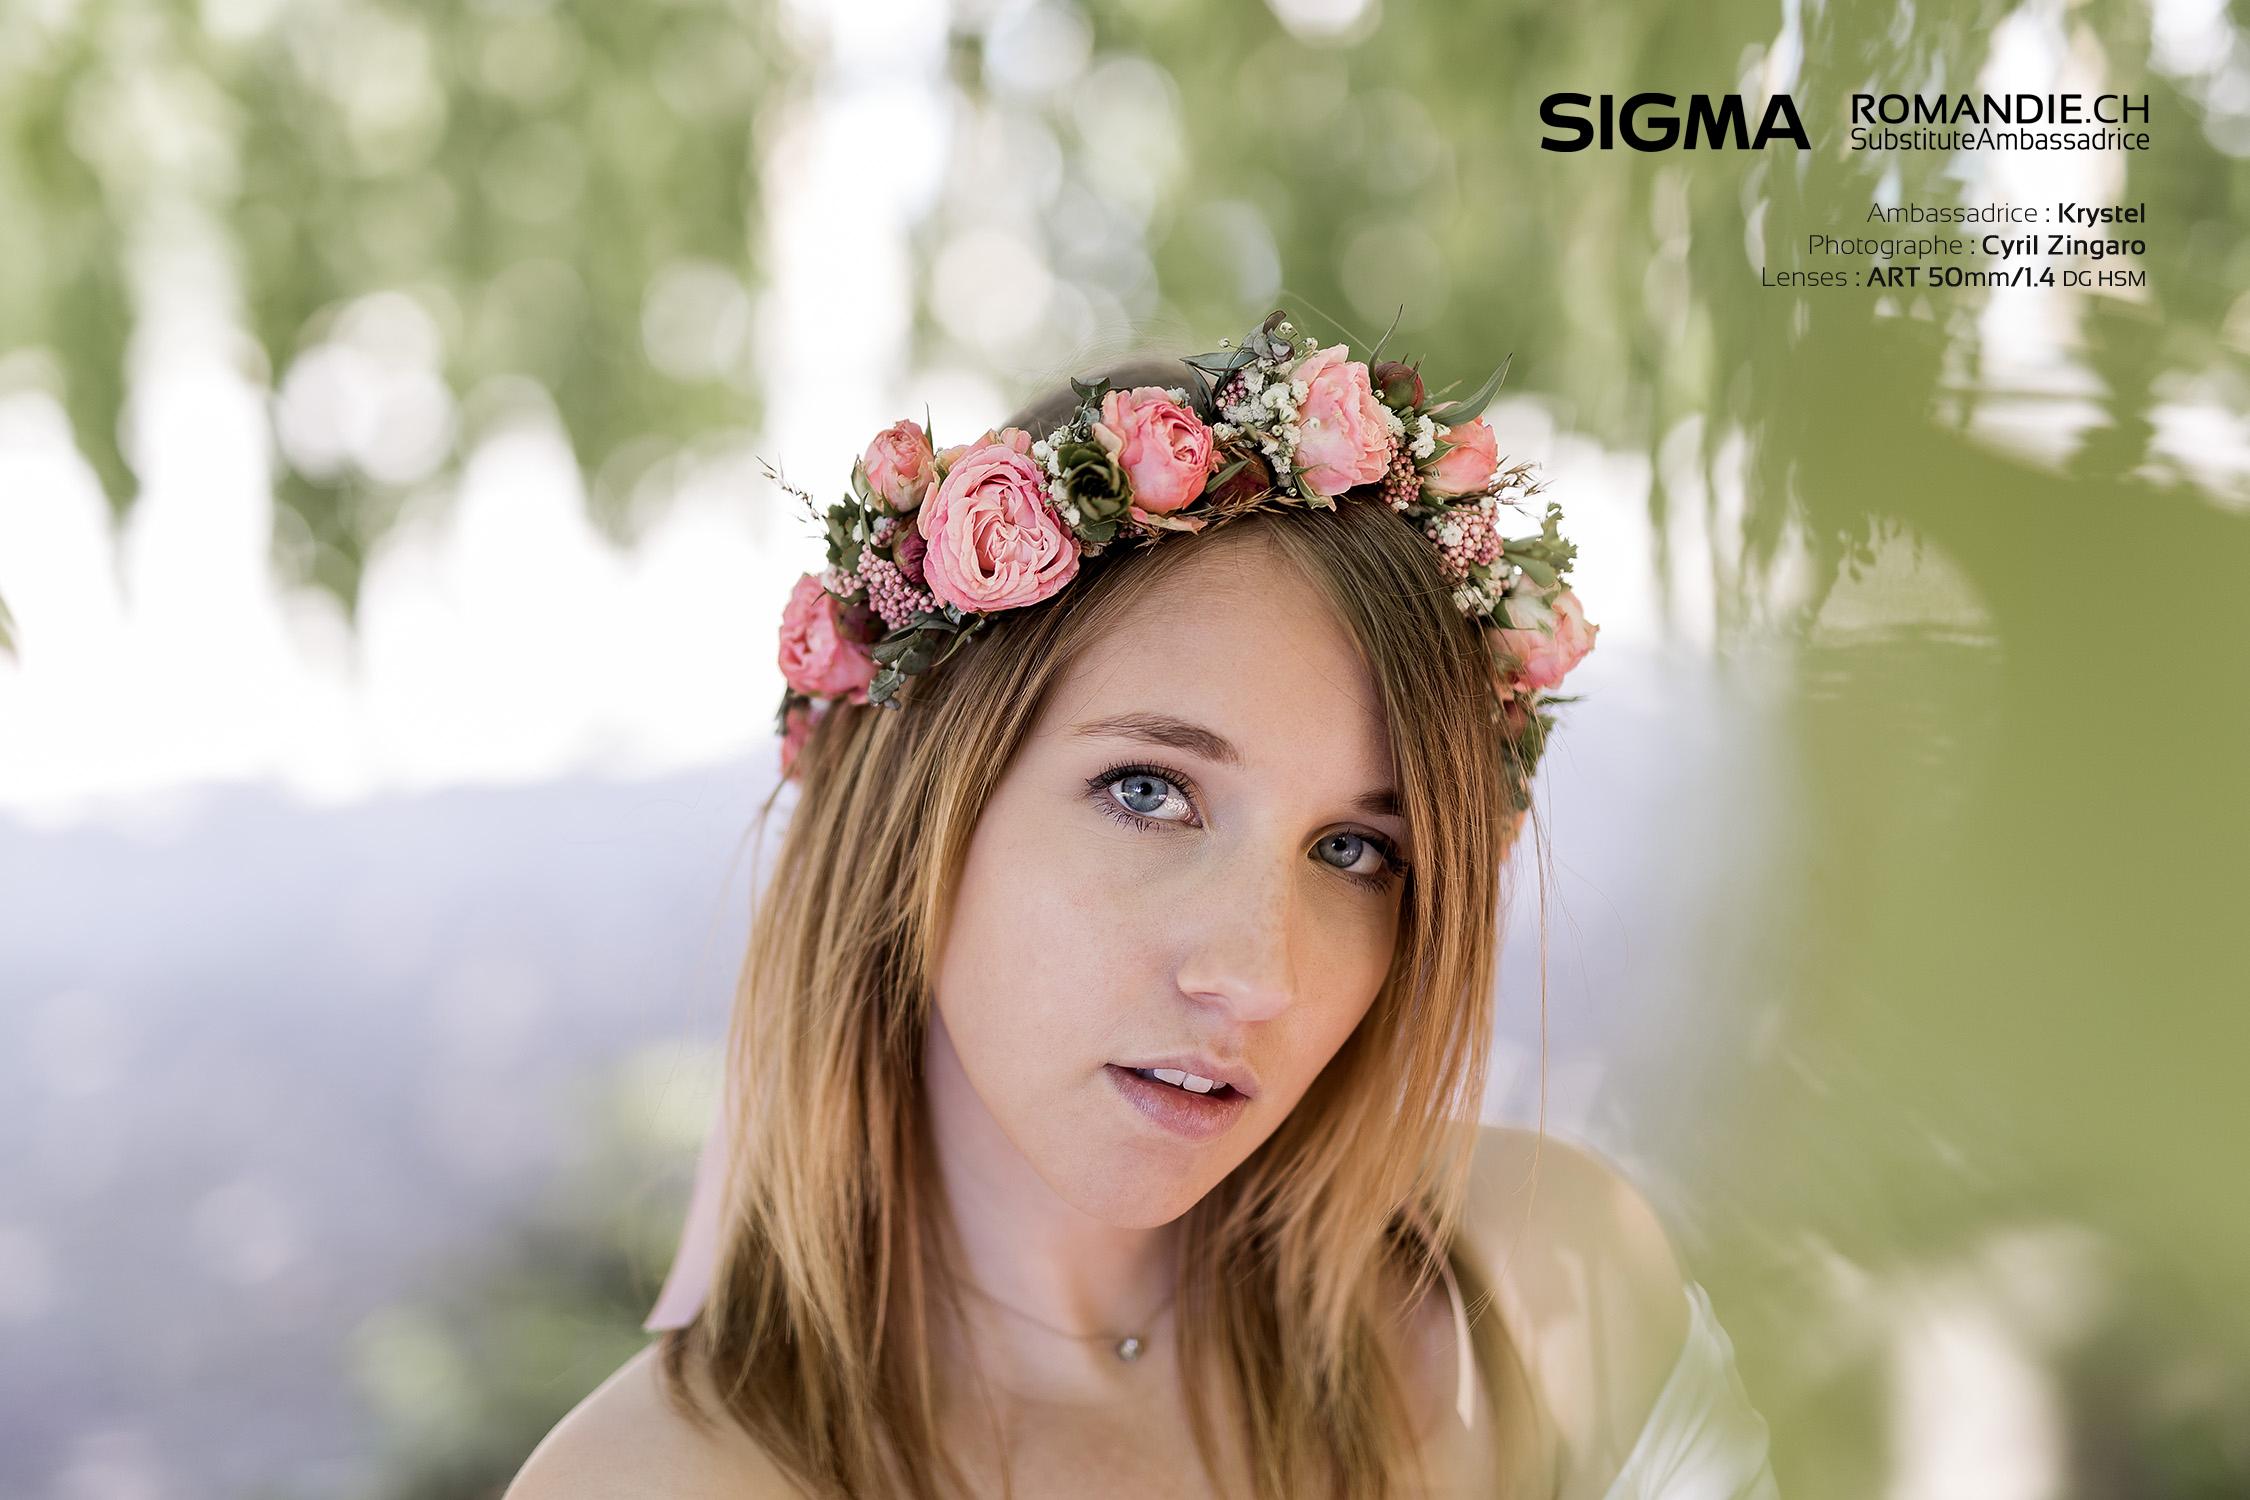 sigma_ambassadrice_2019_10HD